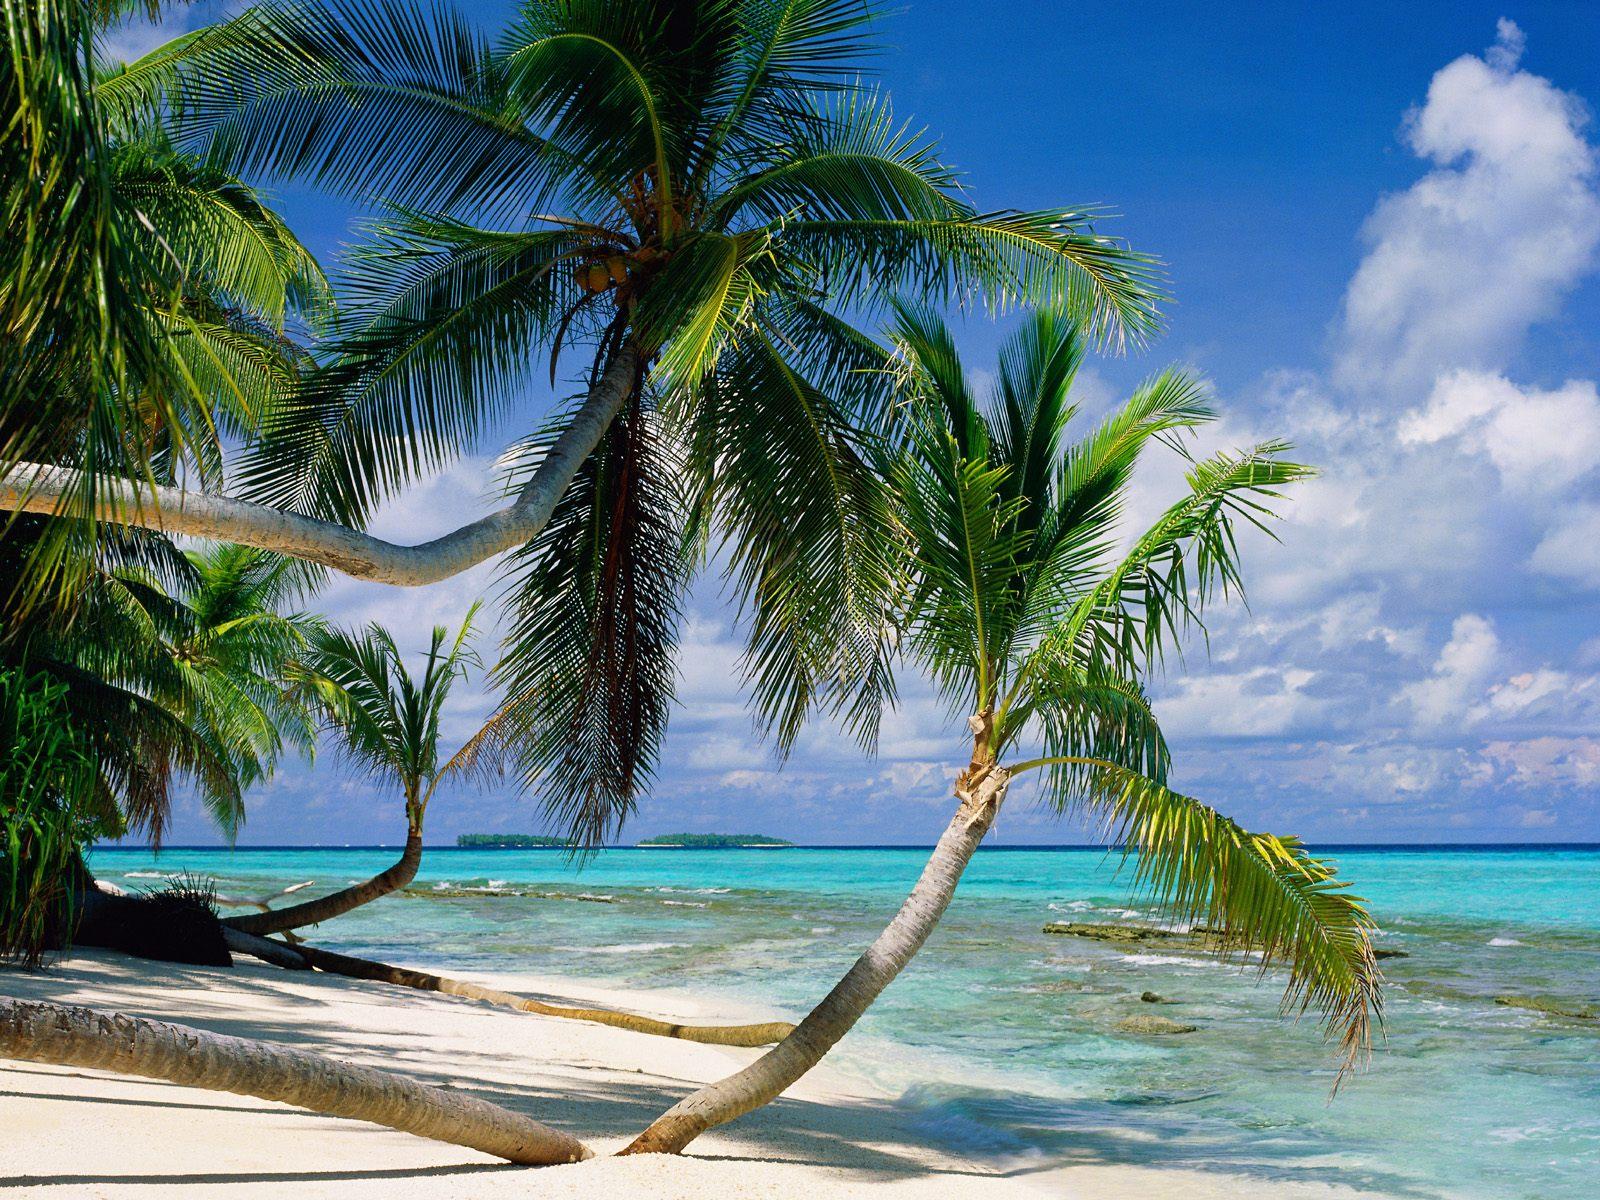 ... picture, Tepuka Island Tuvalu photo, Tepuka Island Tuvalu wallpaper